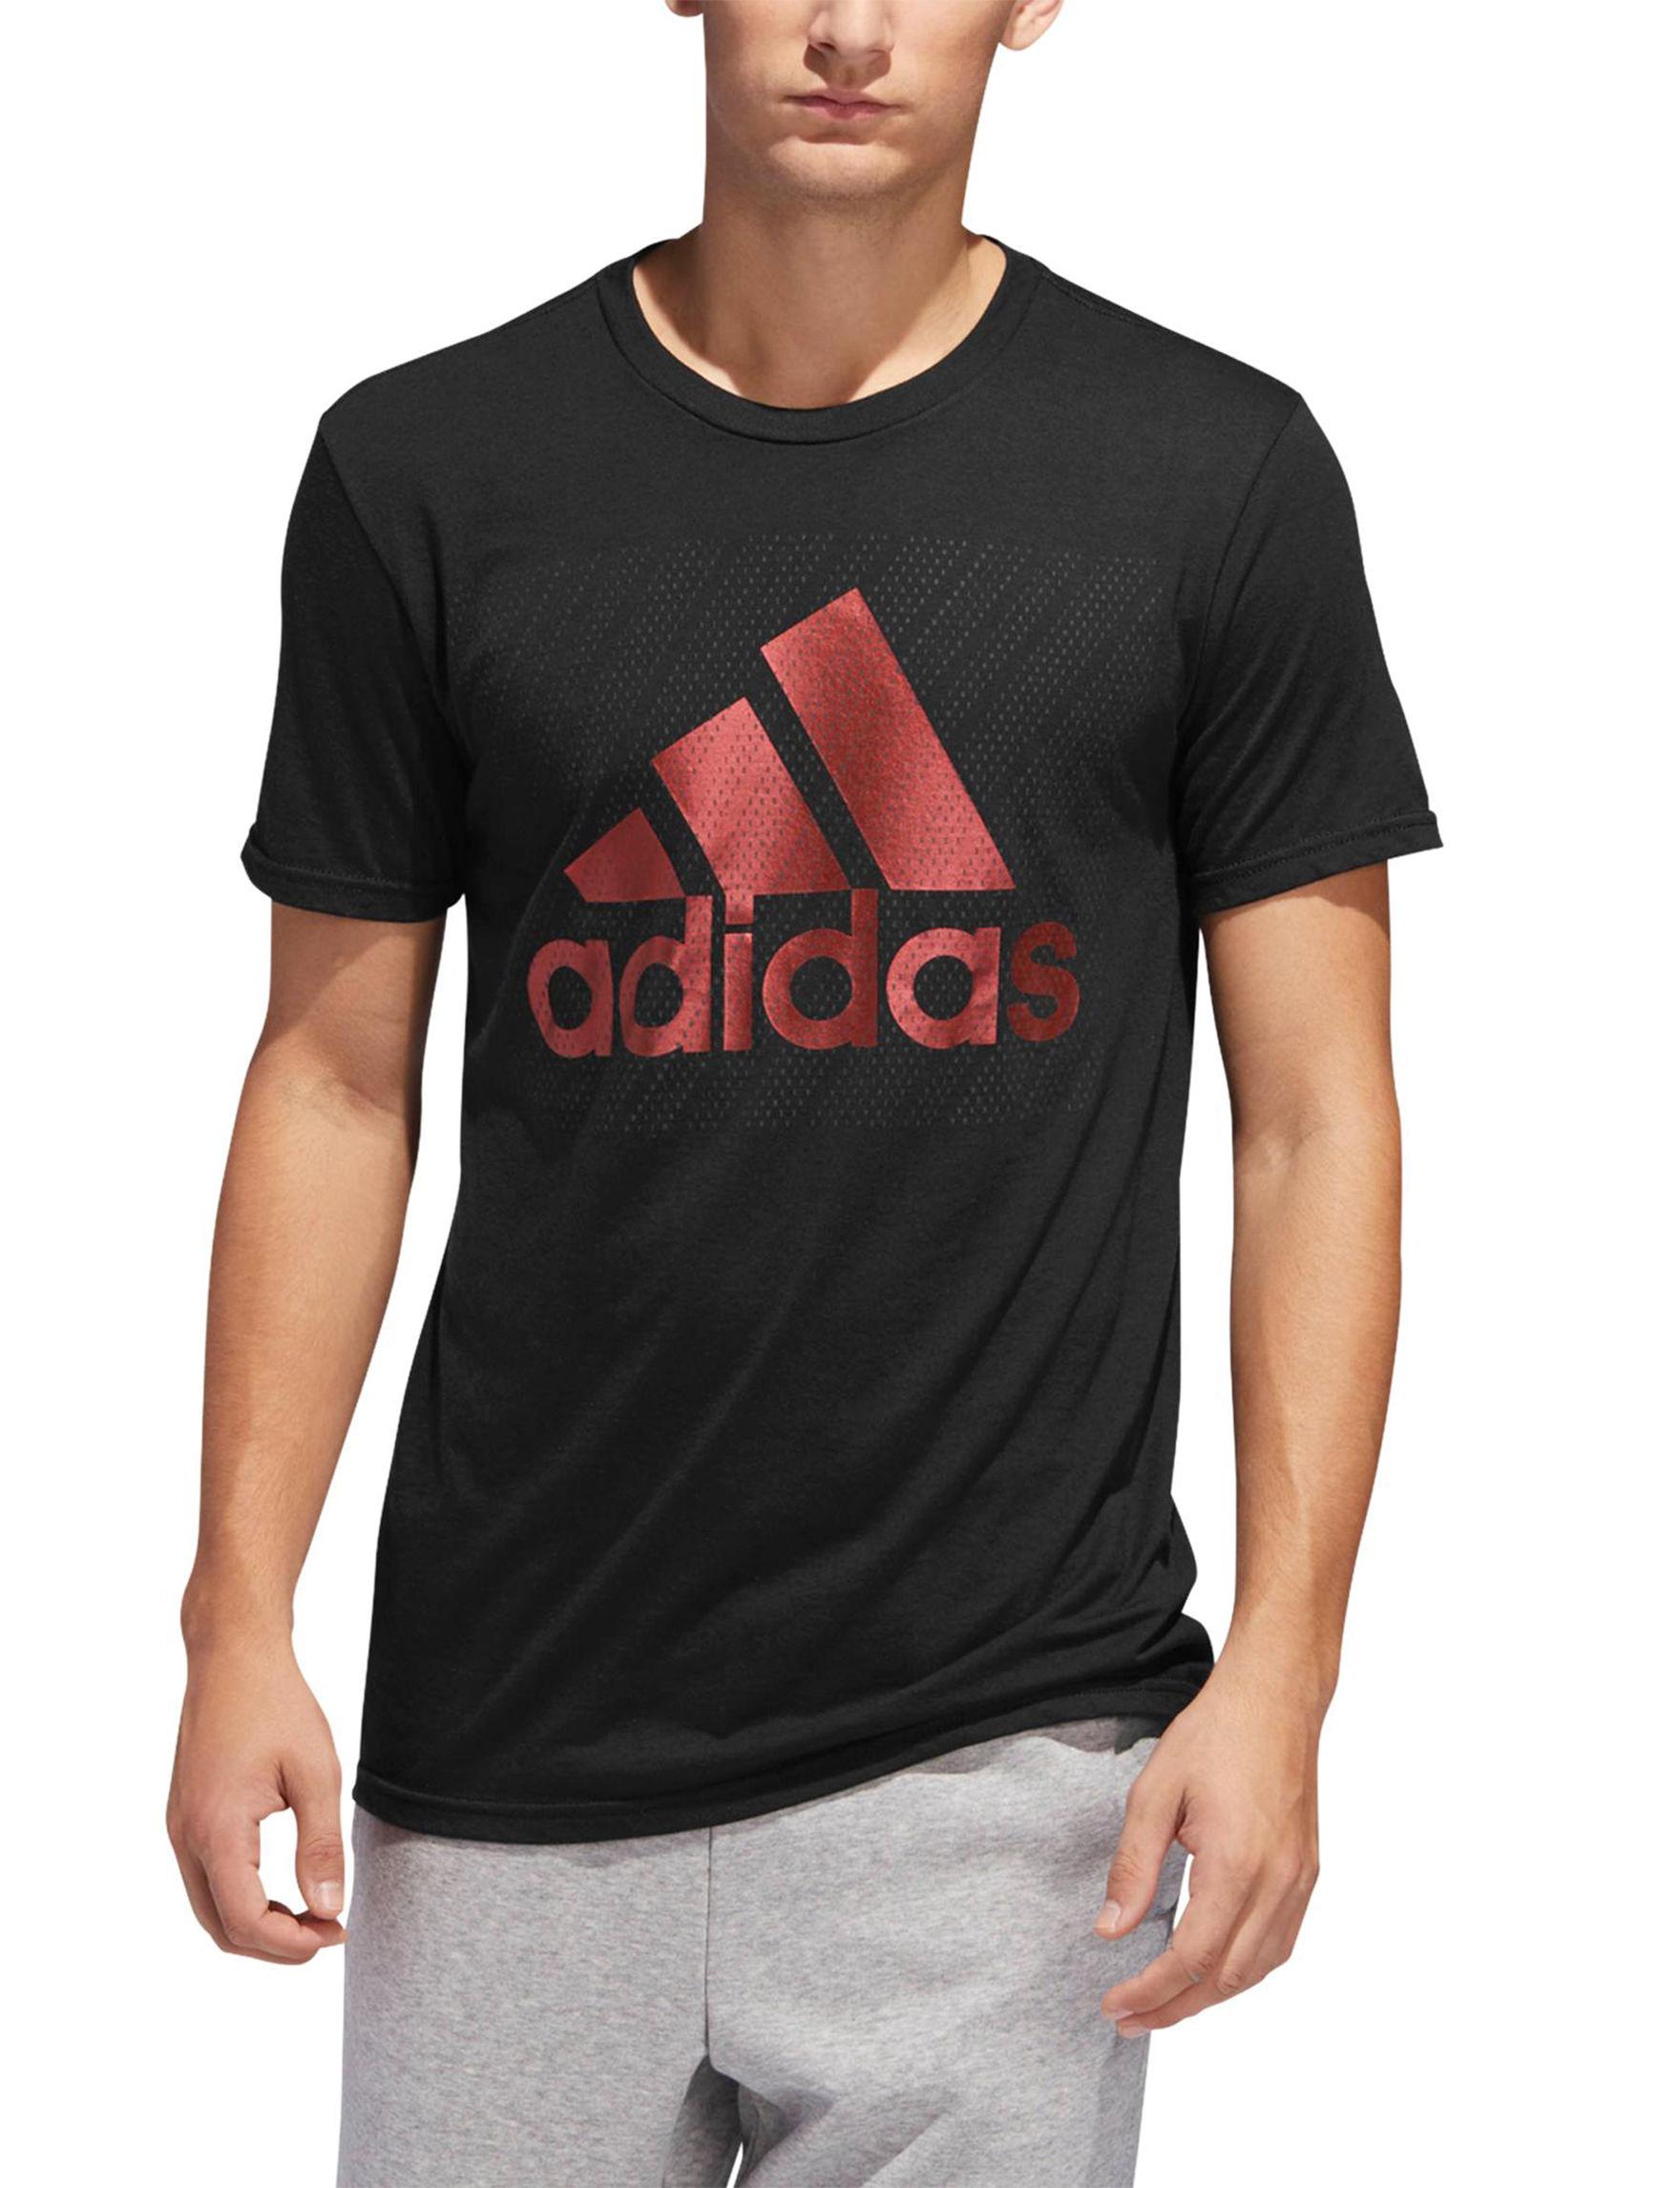 Adidas Black / Red Tees & Tanks